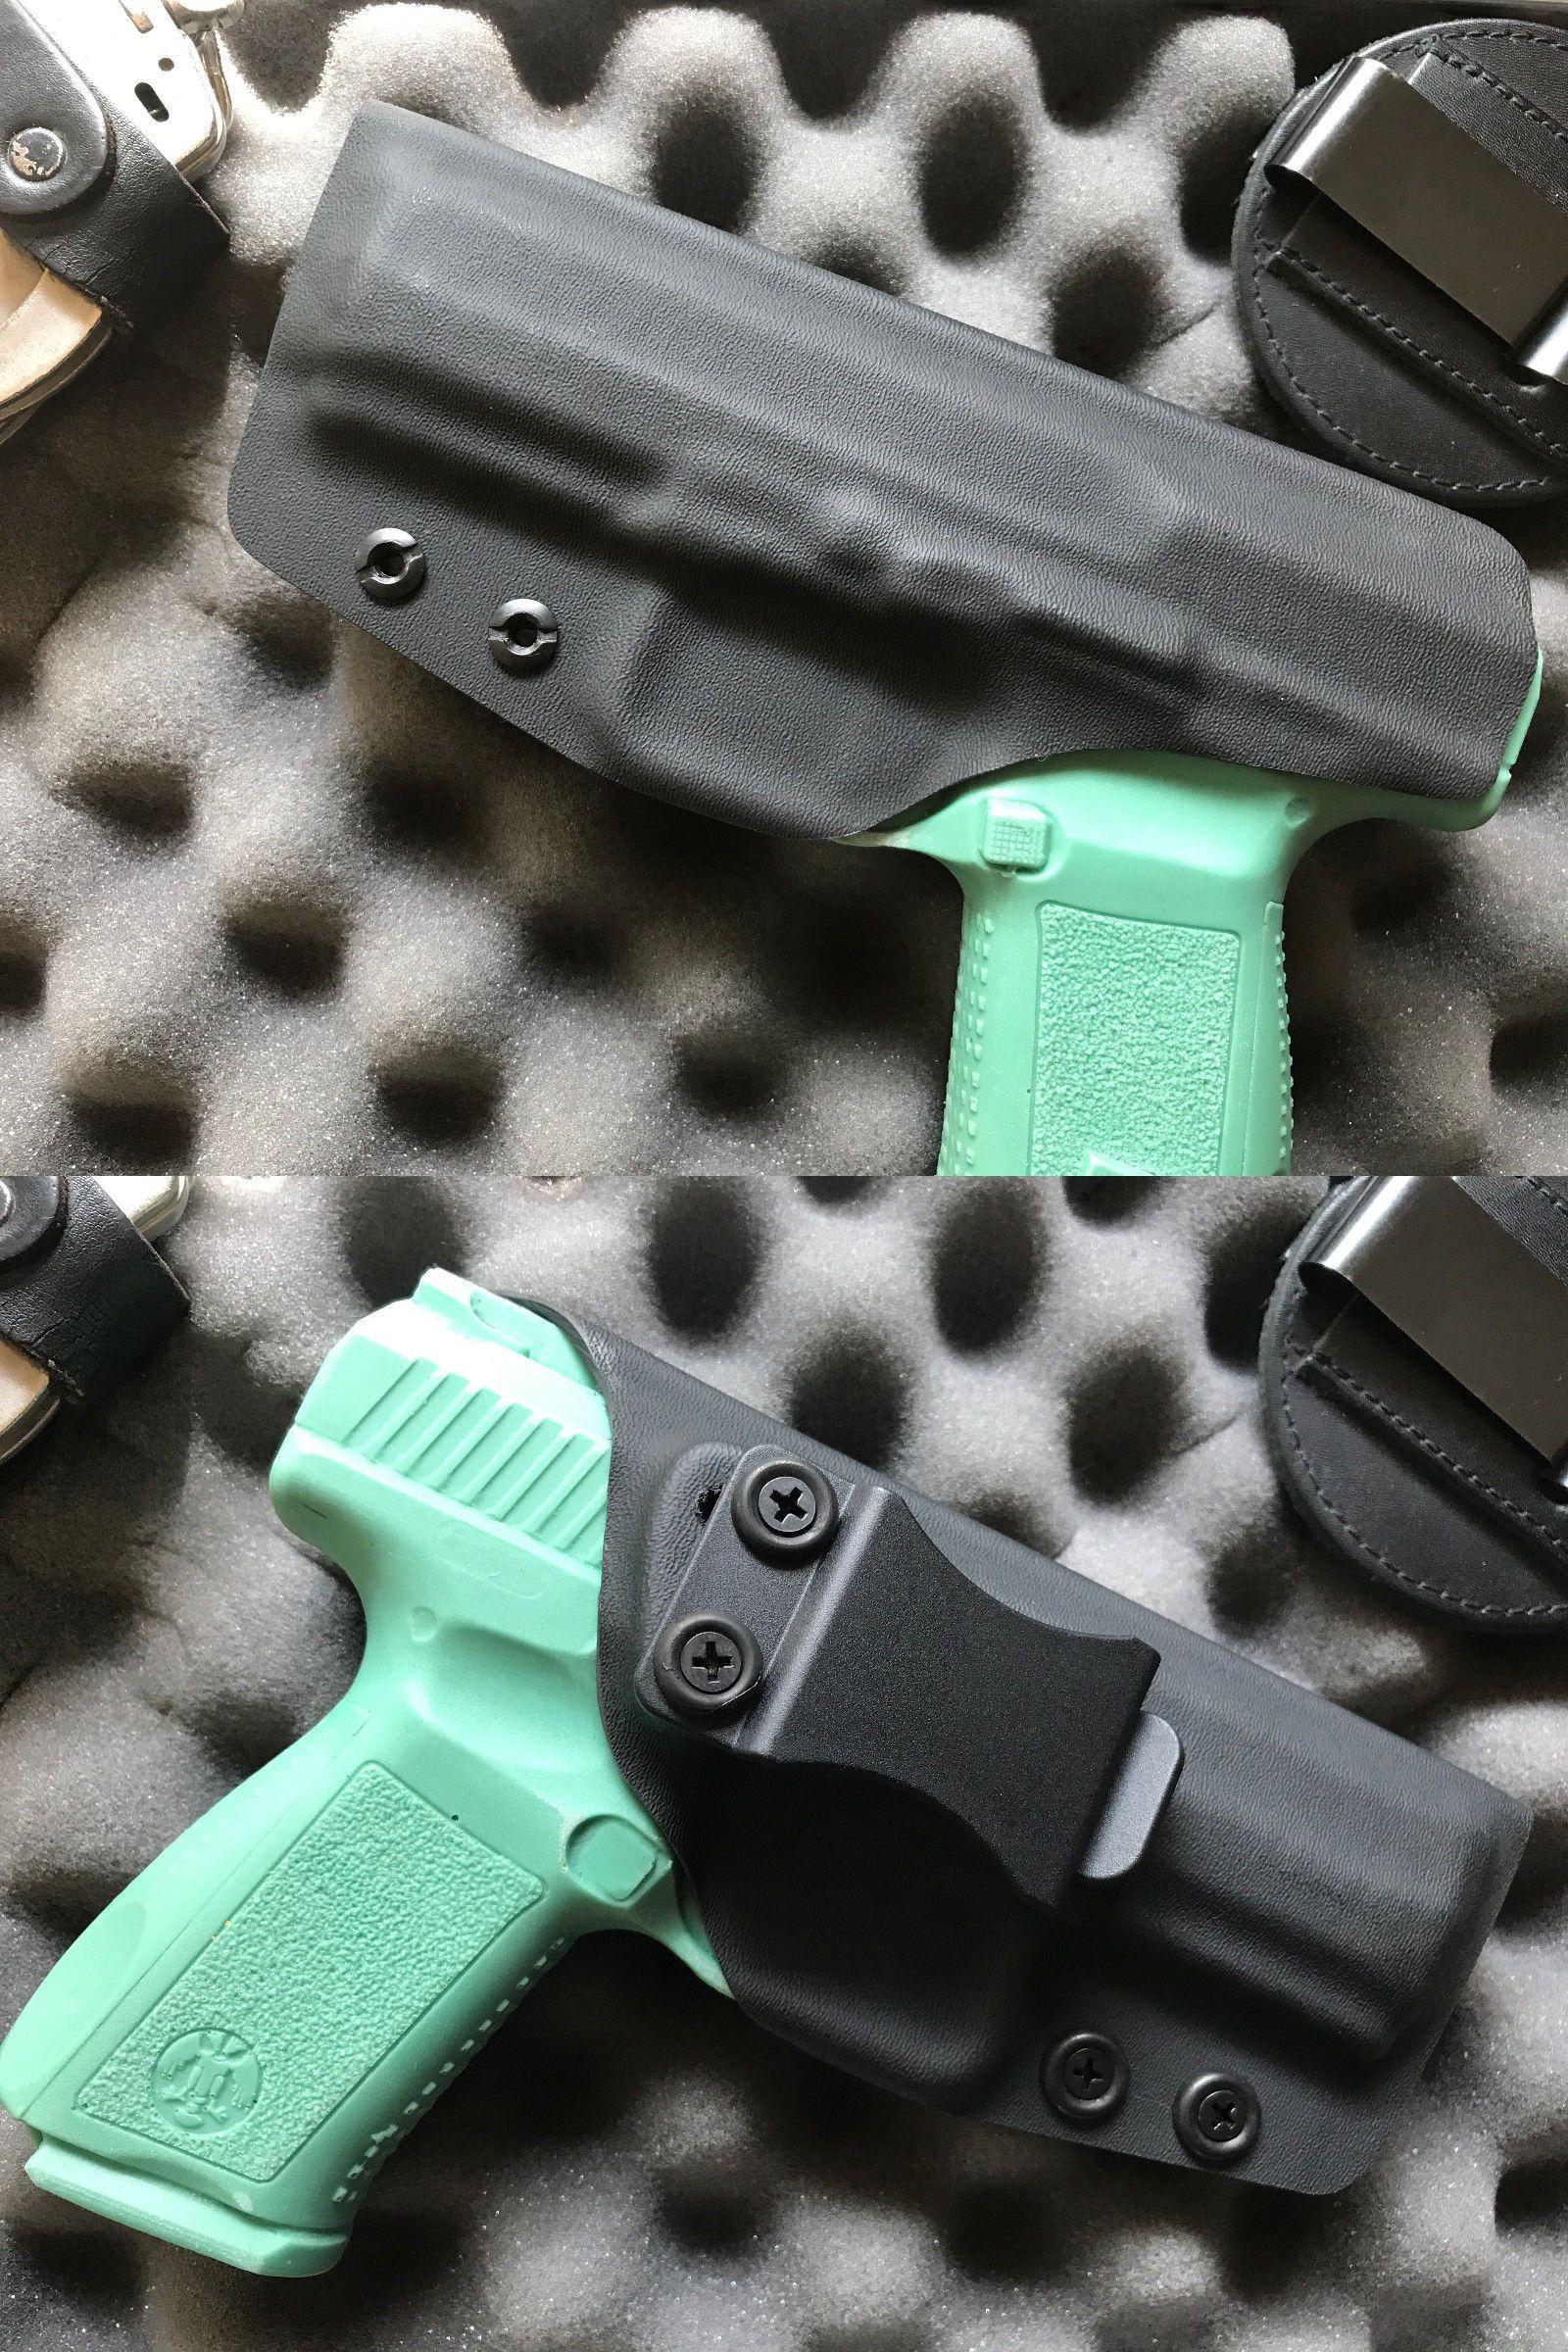 Holsters 177885: Canik Tp9sf Elite Iwb Right Handed Black